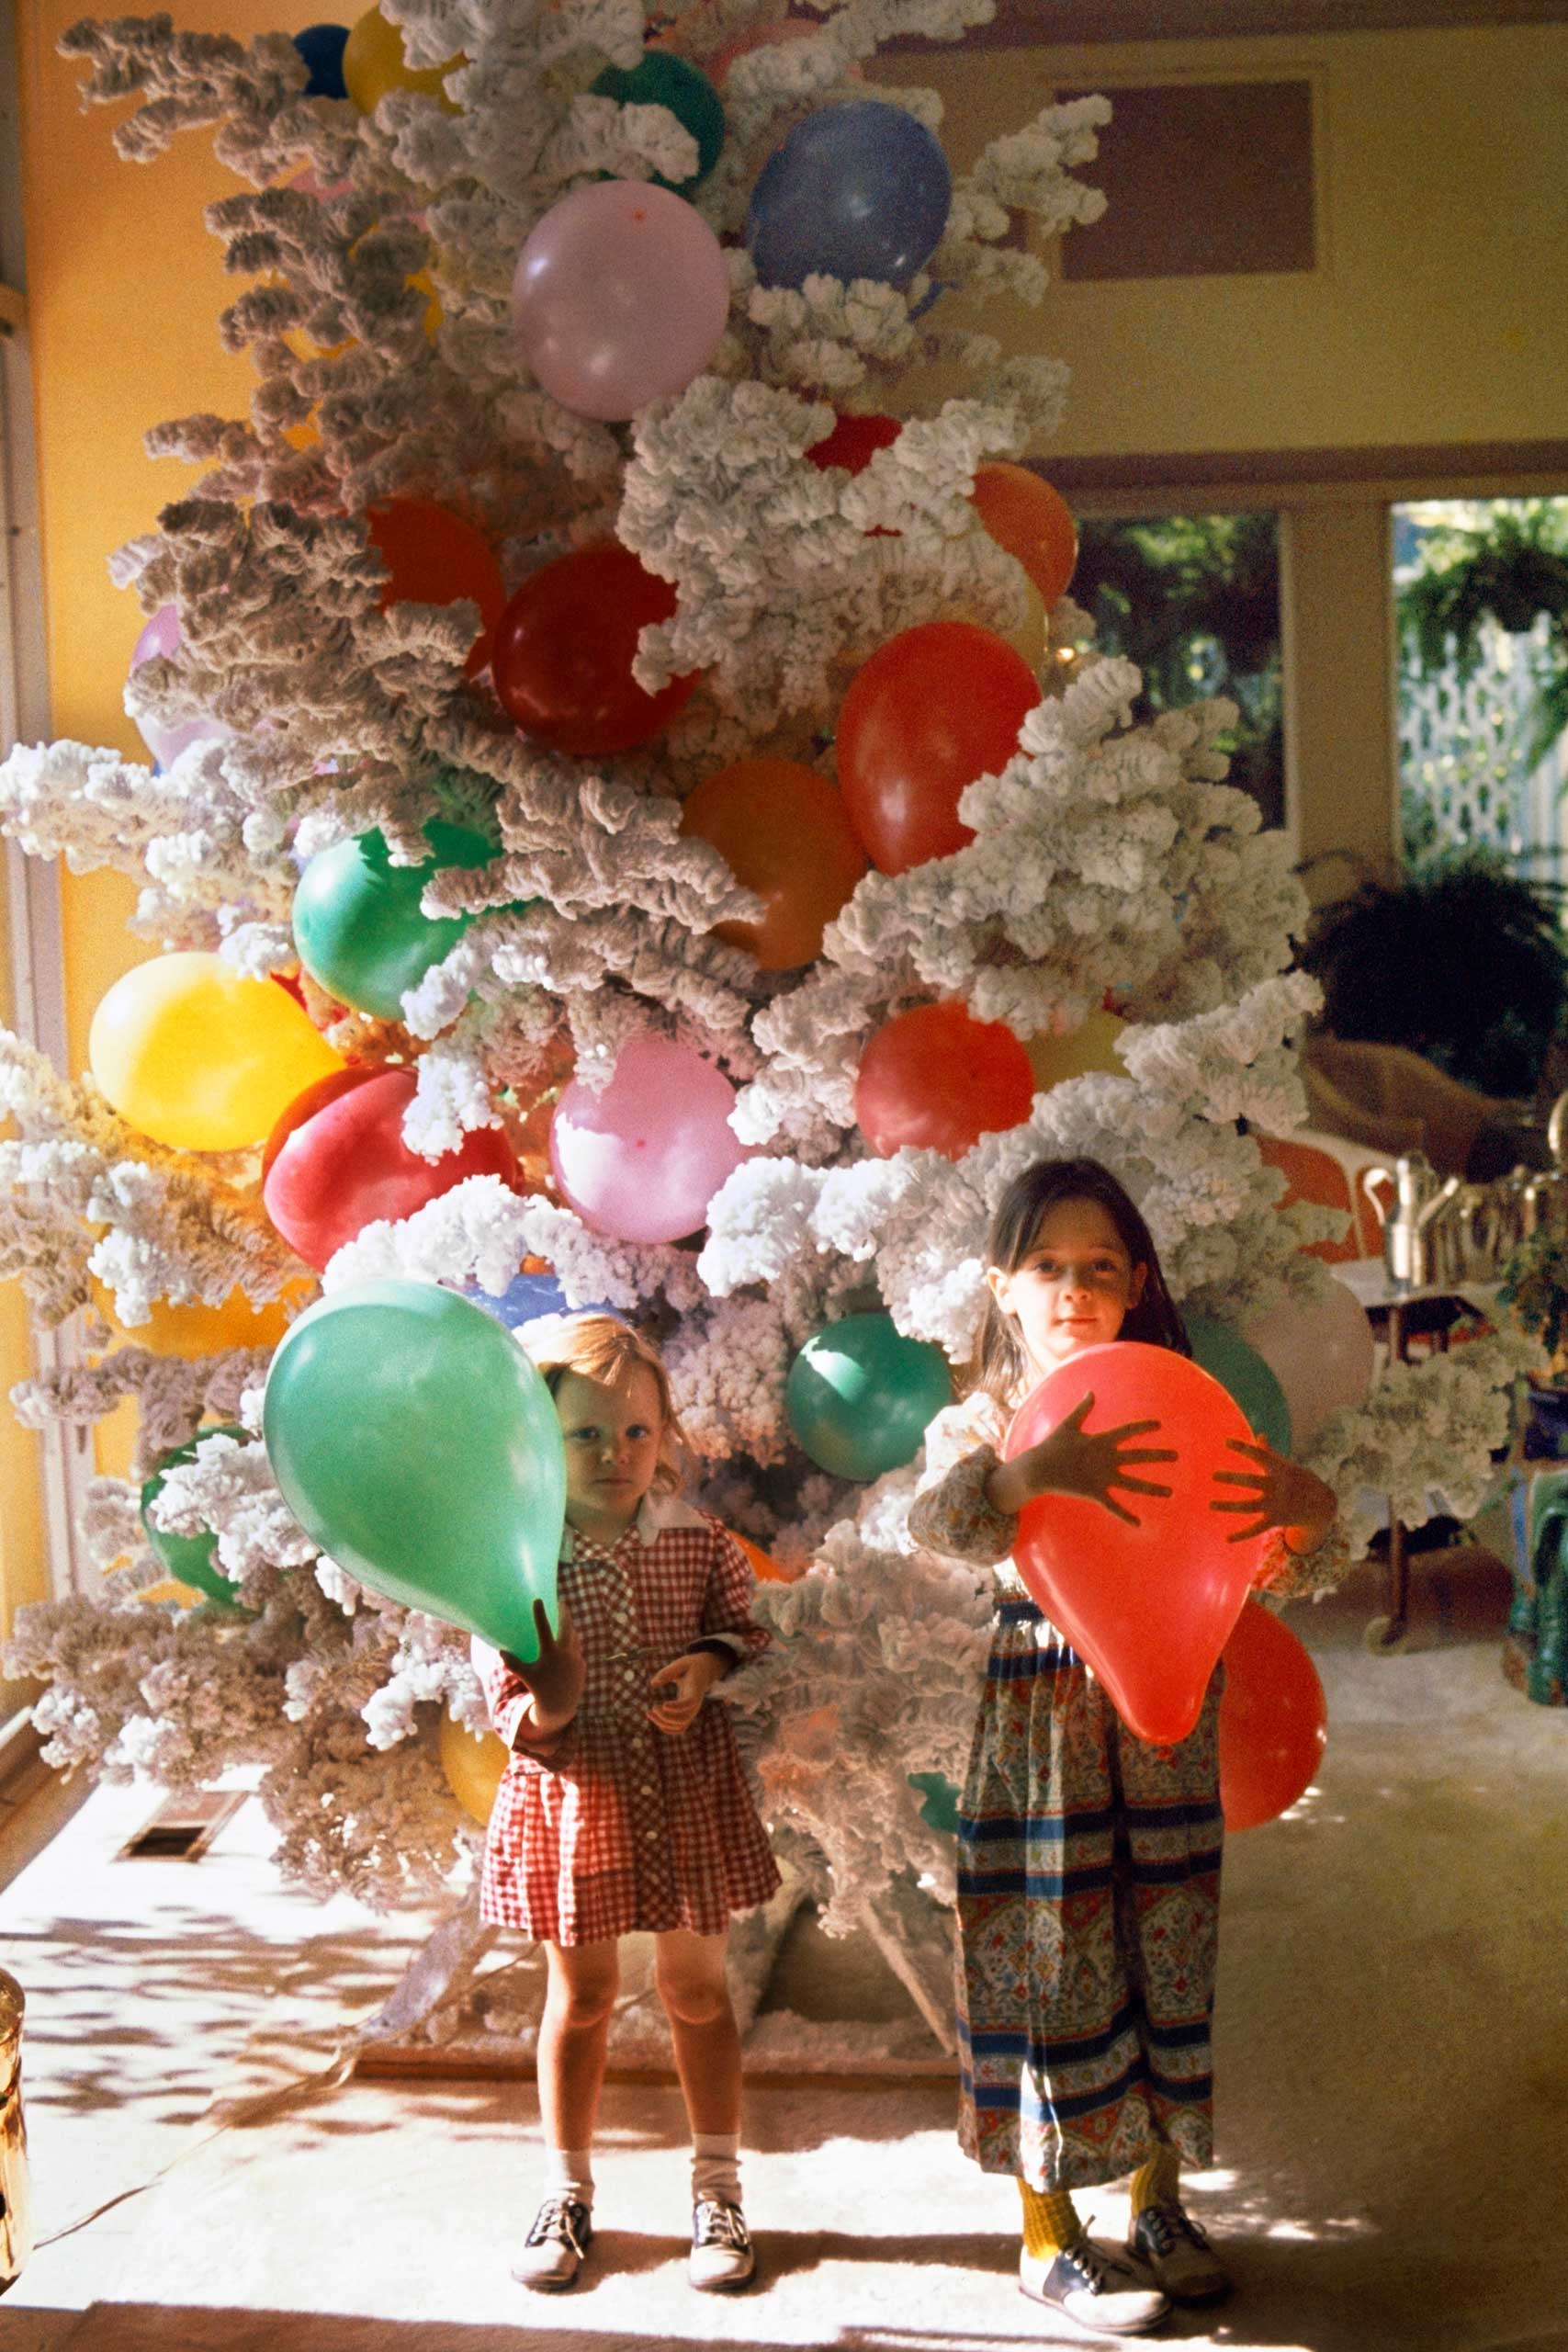 Peggy Lee's Christmas Tree, California, 1974